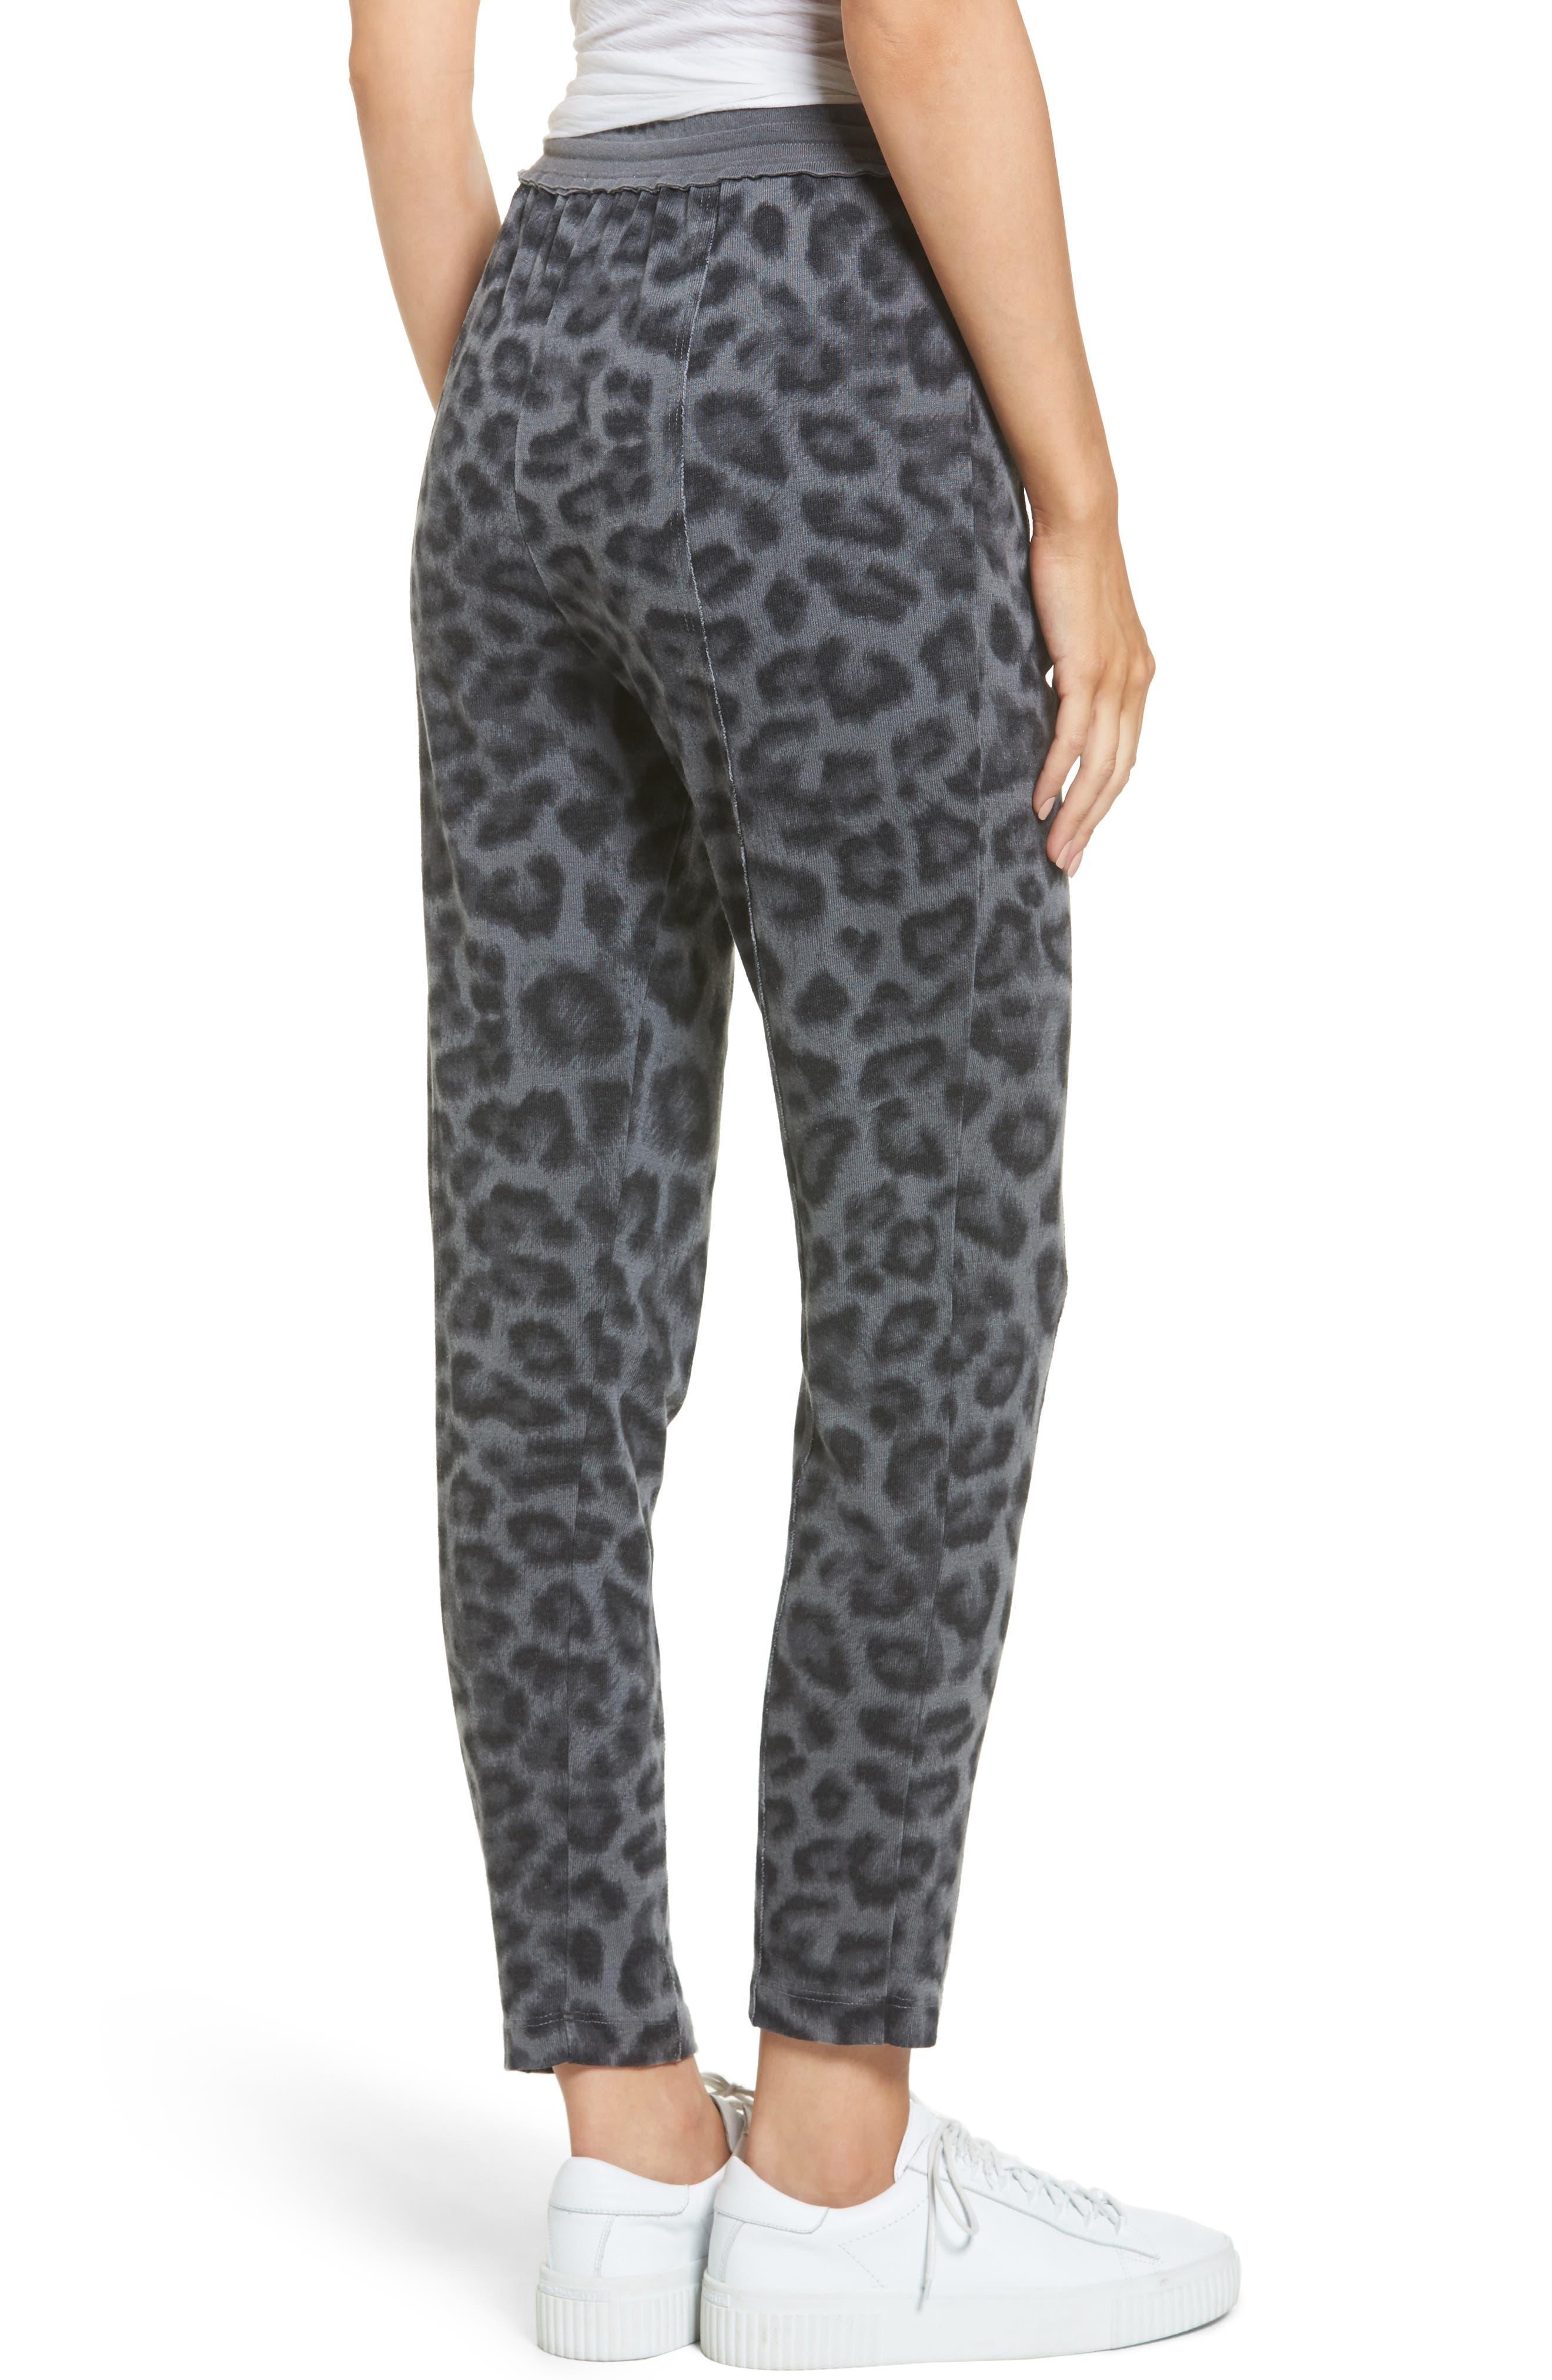 Leopard Print Jogger Pants,                             Alternate thumbnail 2, color,                             032